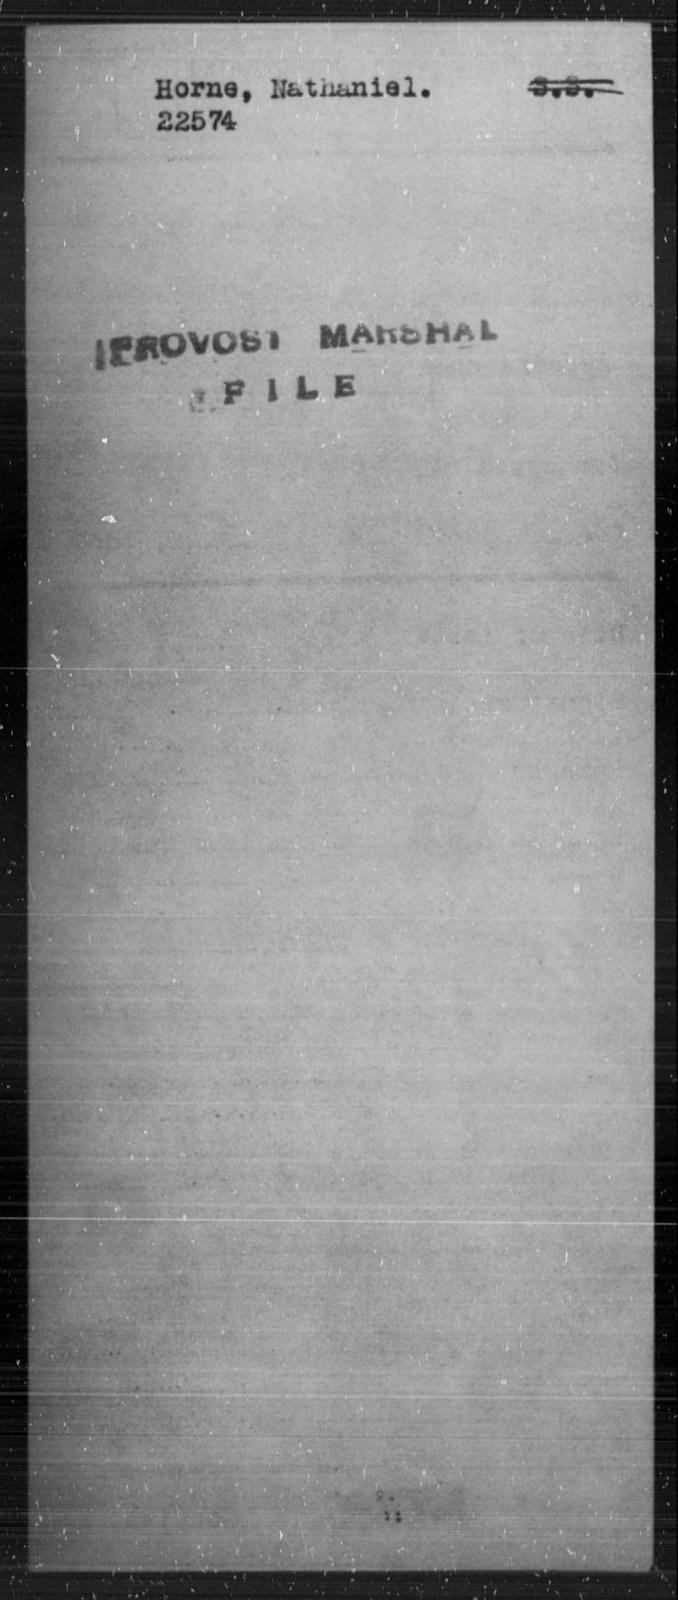 Horne, Nathaniel - State: [Blank] - Year: [Blank]